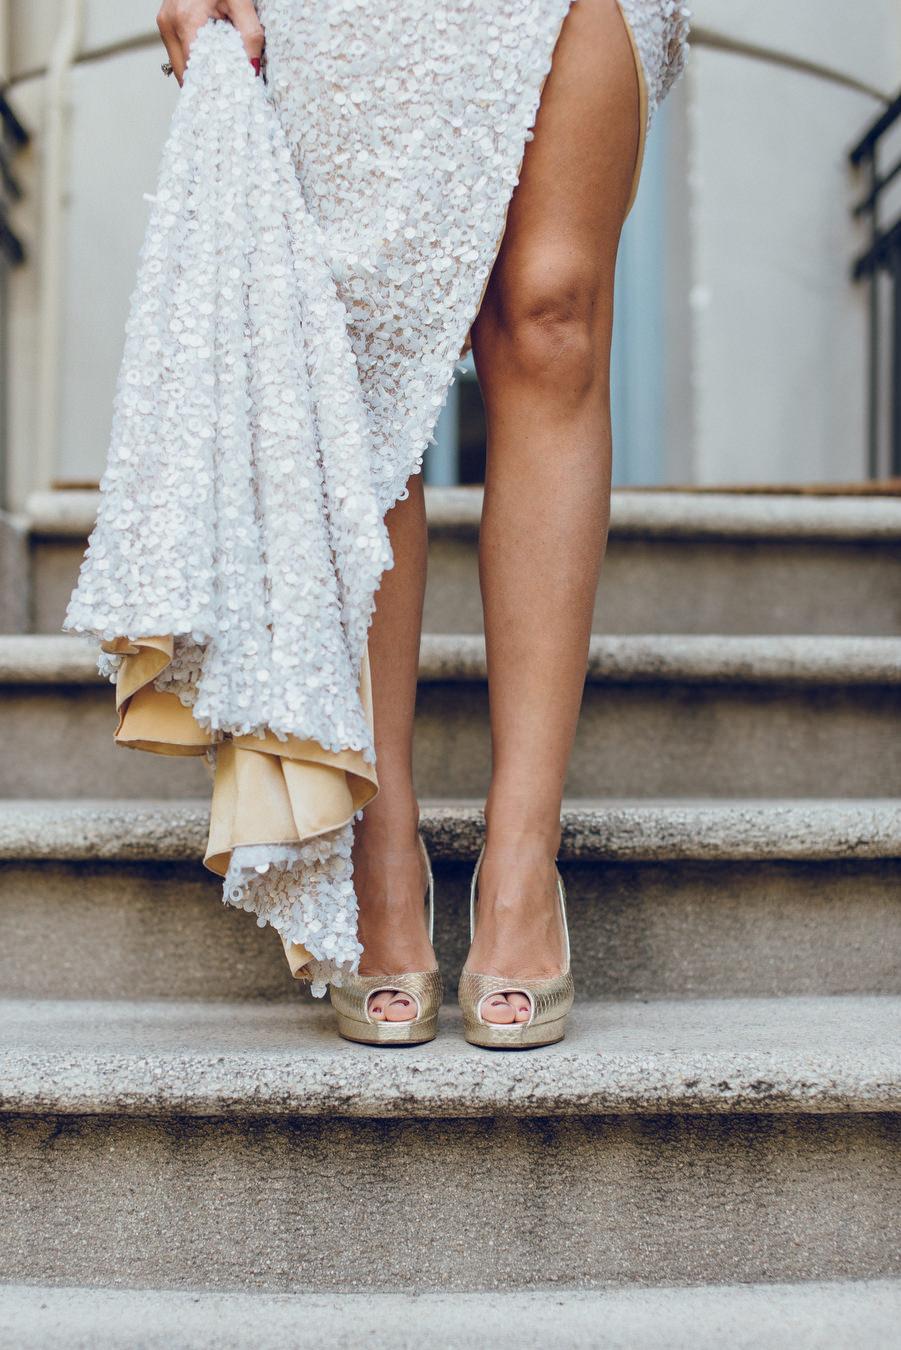 calista-one-lista-de-bodas-online-blog-de-bodas-bossanova-looks-invitadas-pepe-botella